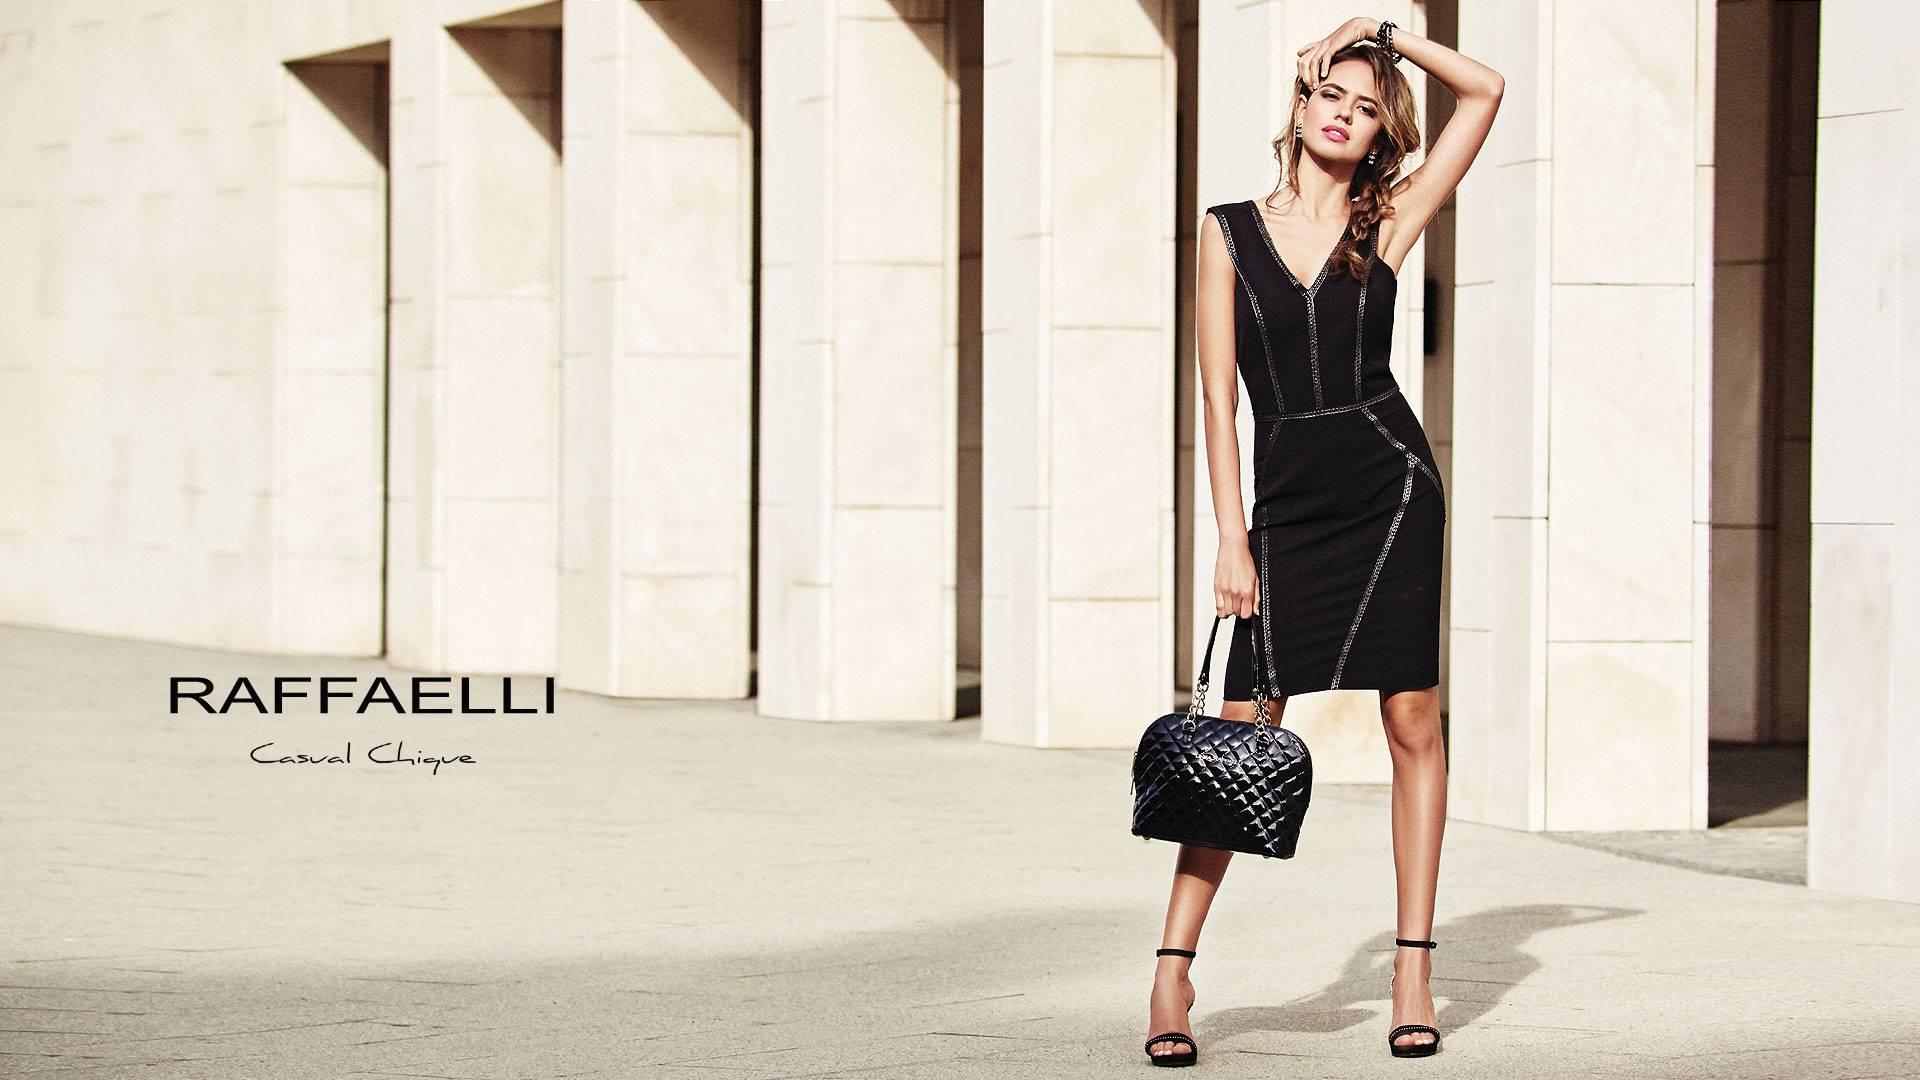 Raffaelli - Casual Chique